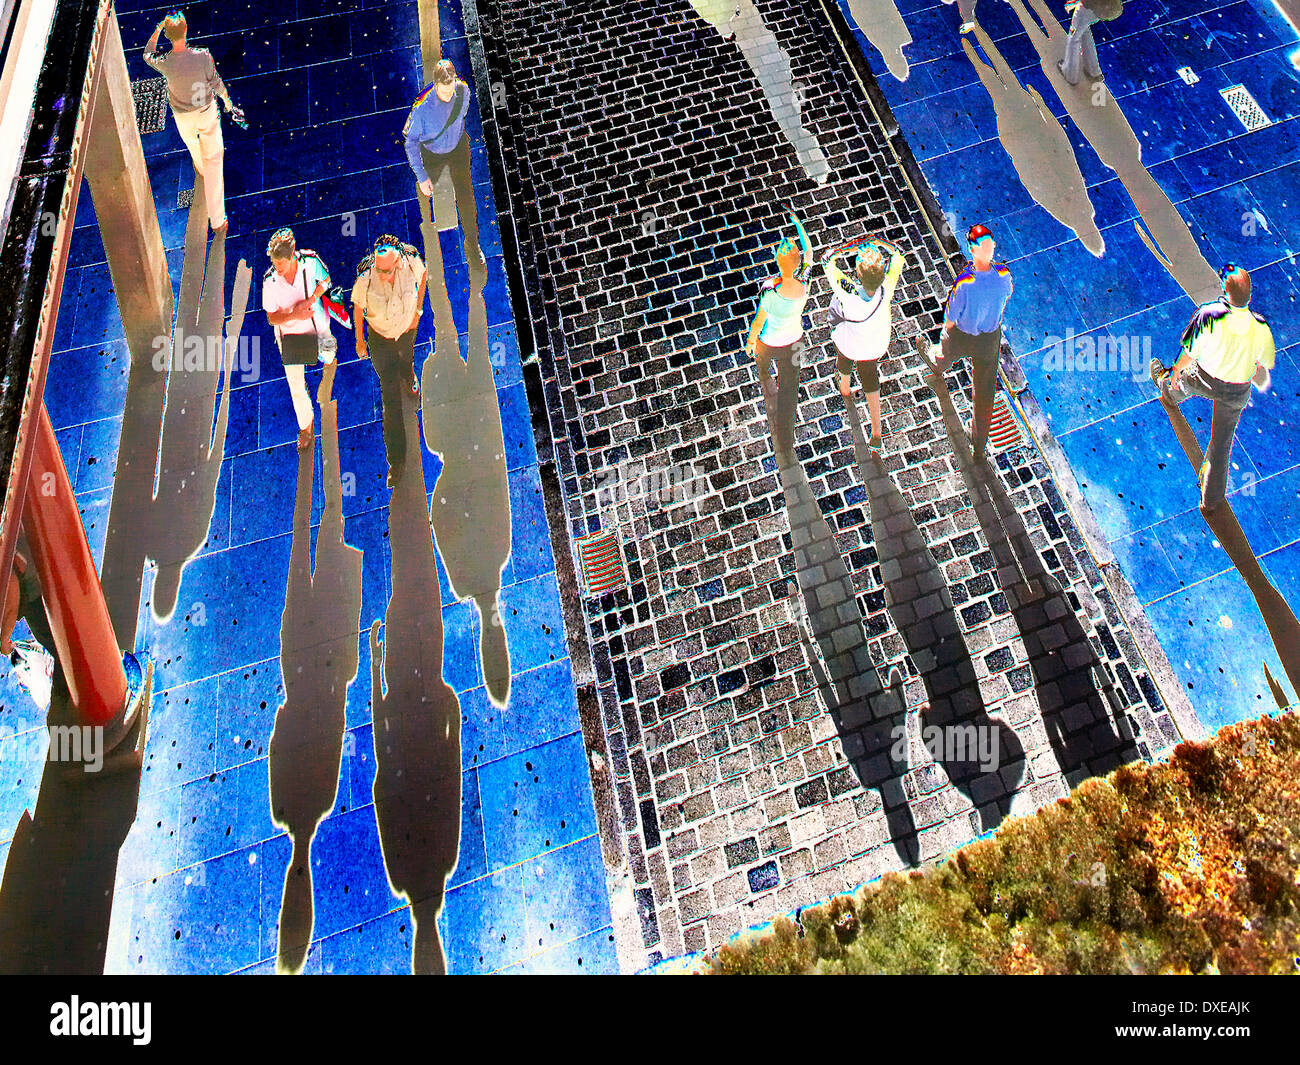 Abstract art, City of Shadows - Stock Image